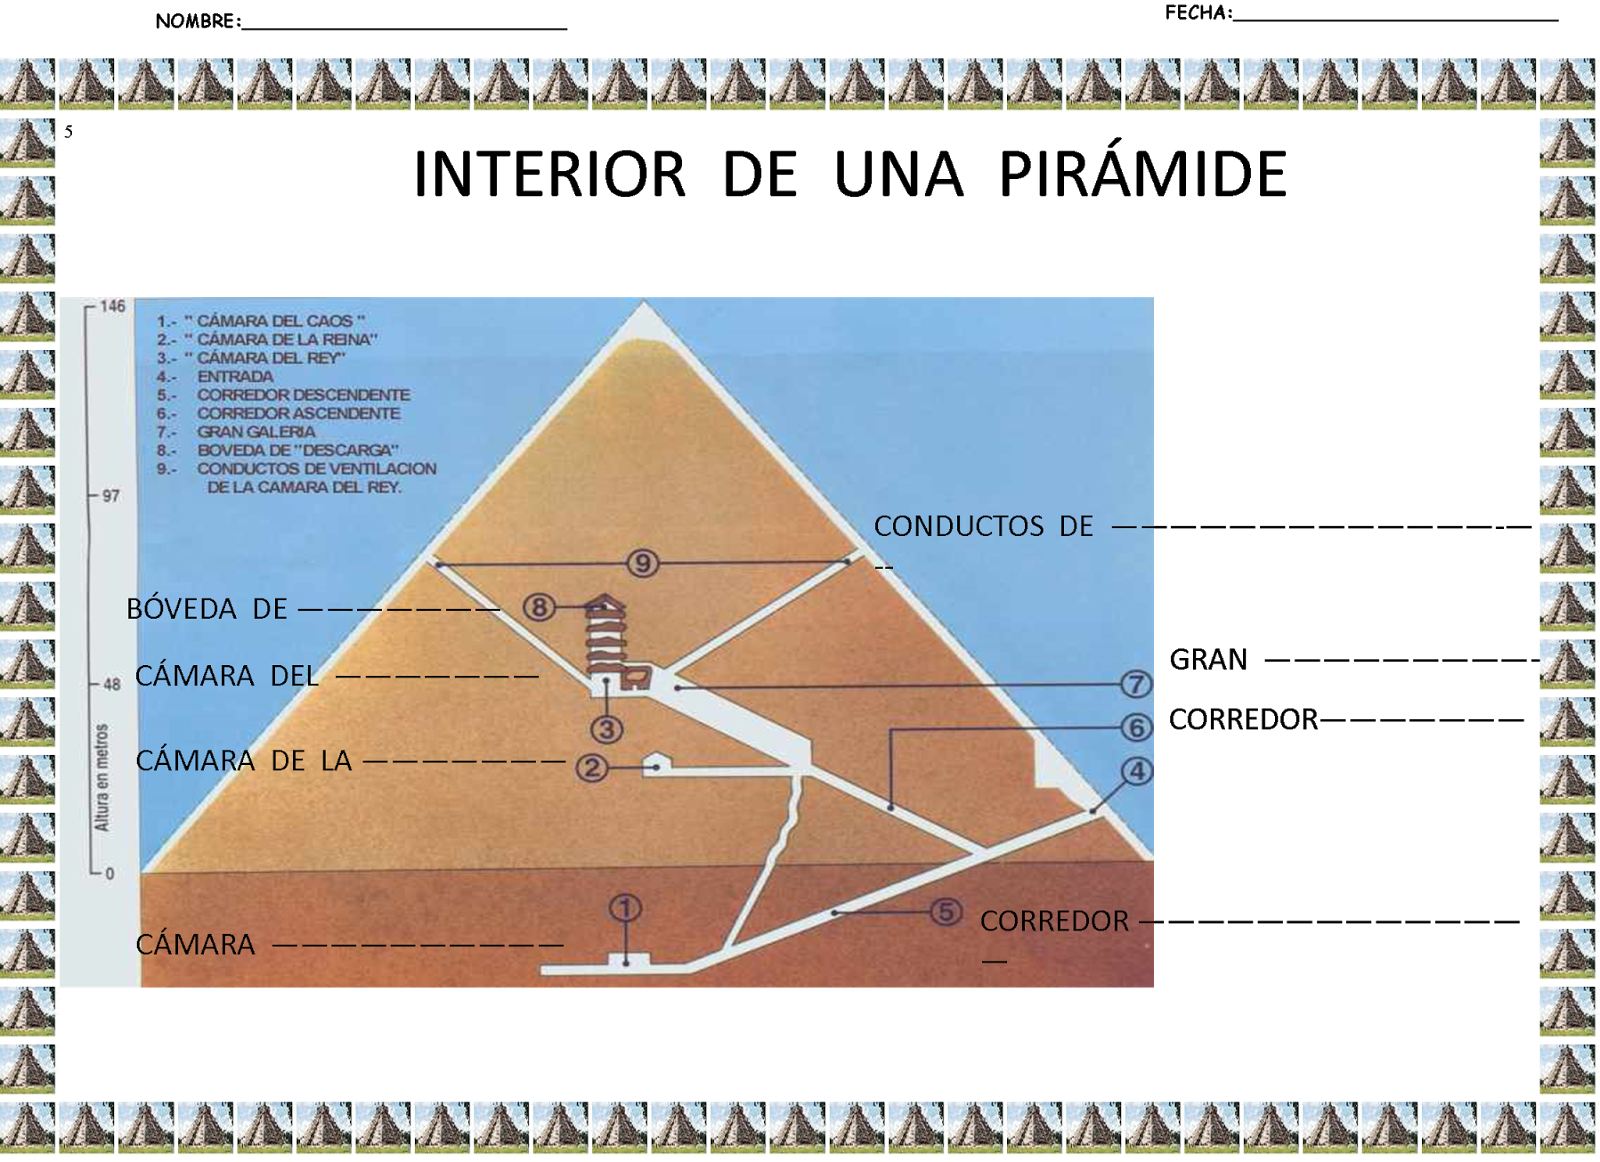 La Gran Piramide De Keops Piramides De Egipto Piramide De Keops Egipto